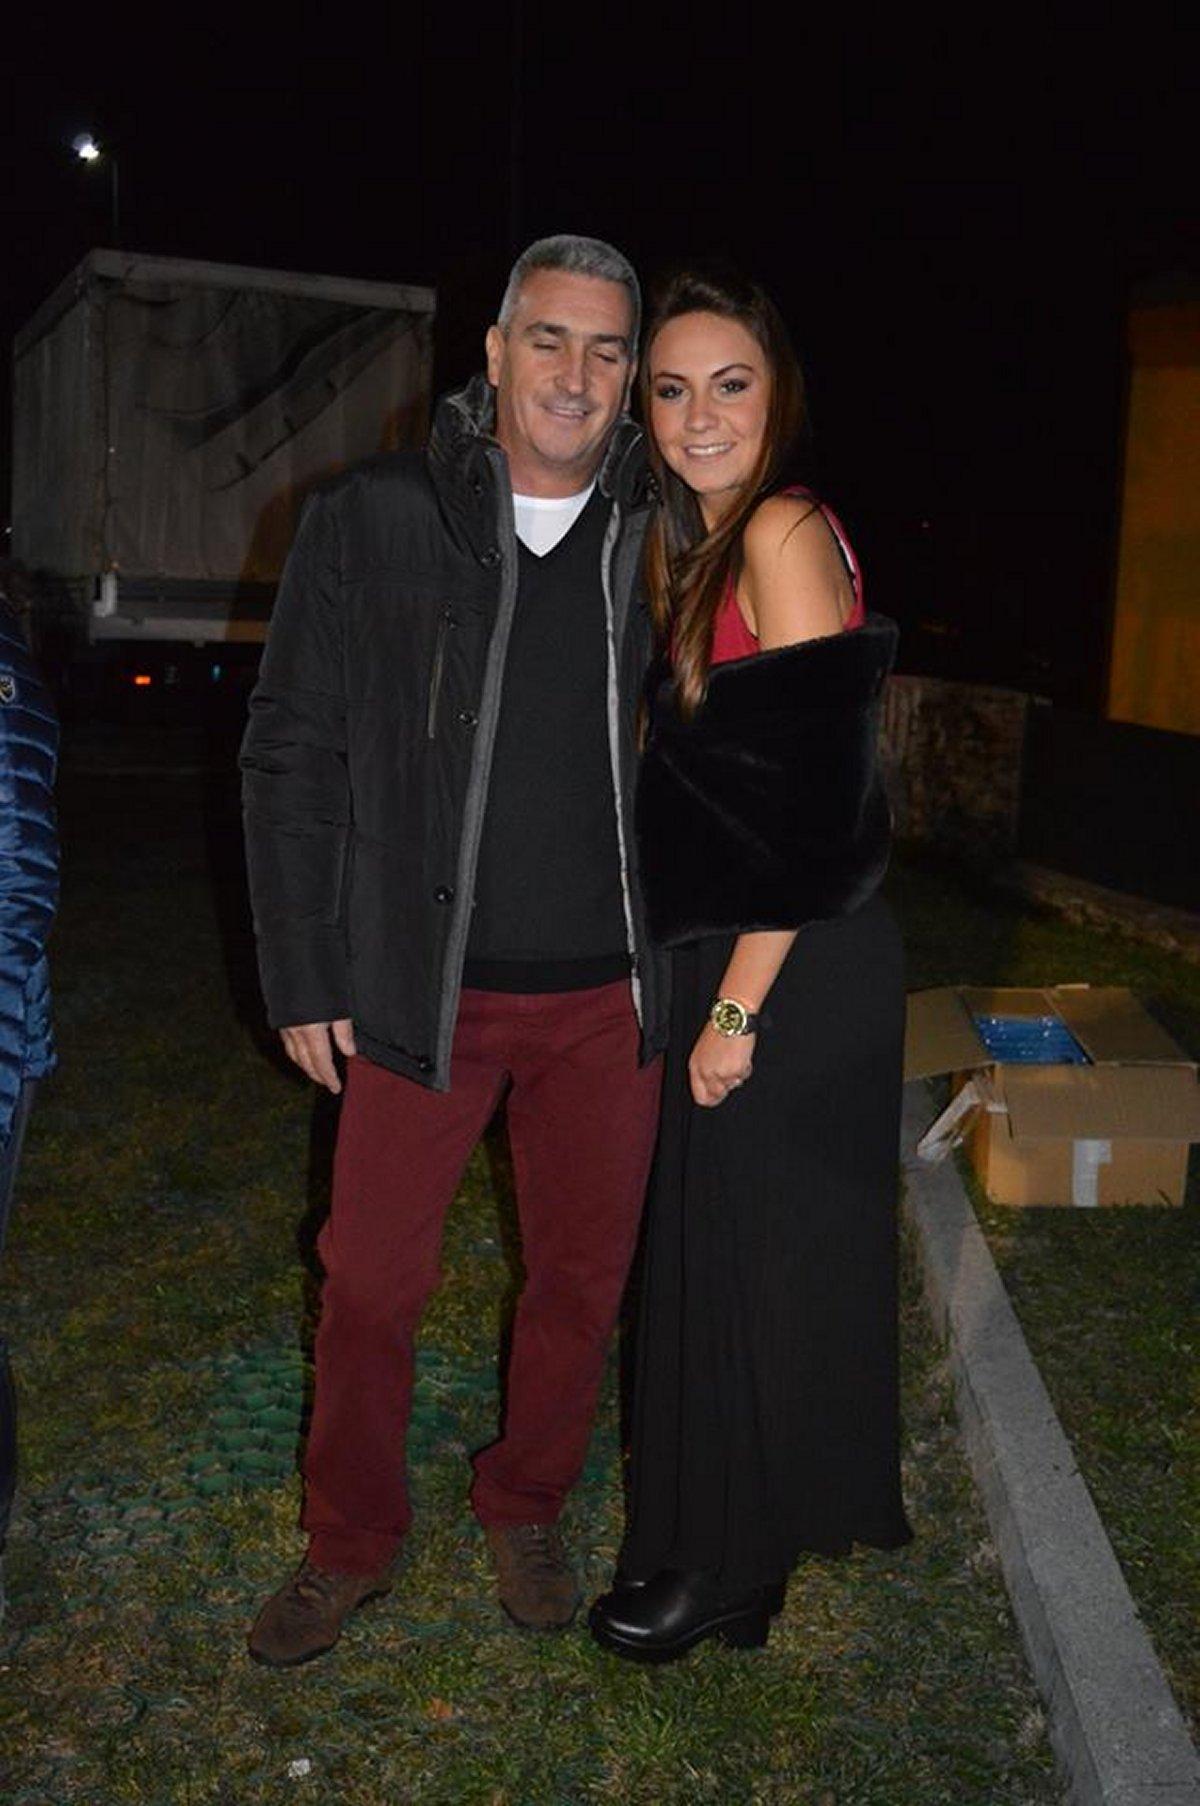 sfilata  autunno inverno 2015 a Cunardo by Moderno Sport